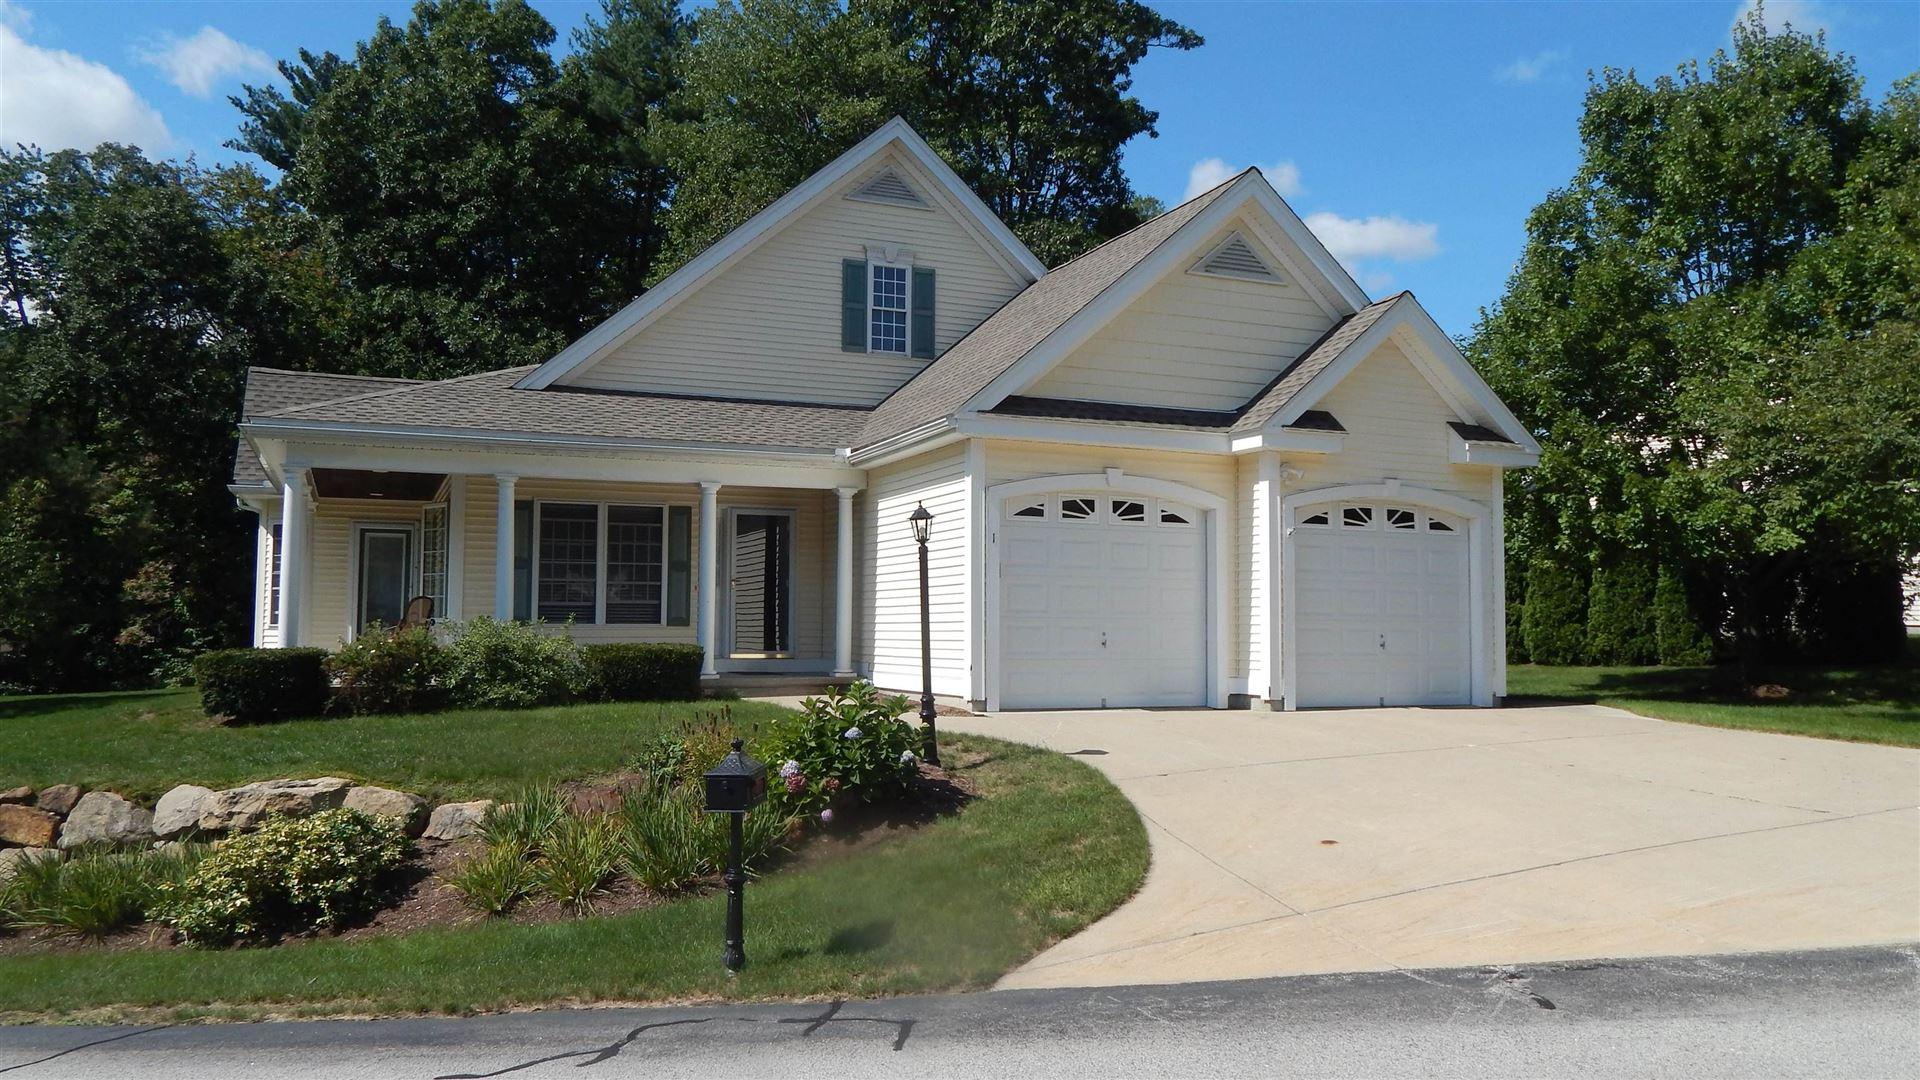 1 WINDCHIME Drive, Bow, NH 03304-3729 - MLS#: 4882972